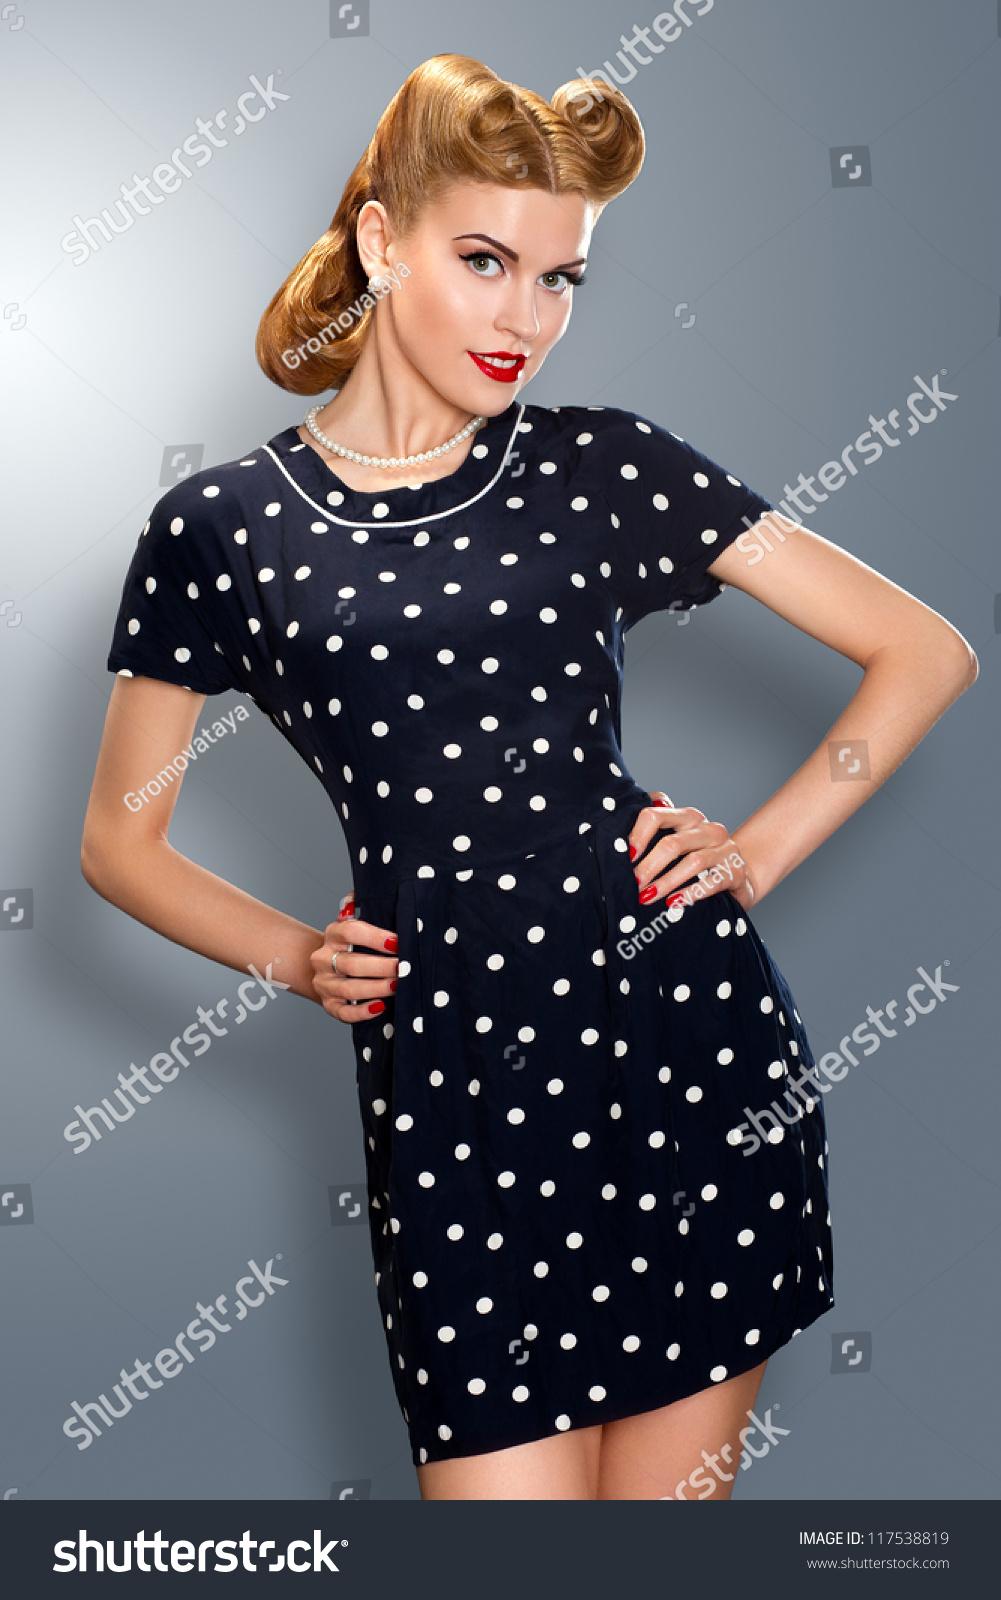 Vintage Pin Up Girl Dresses